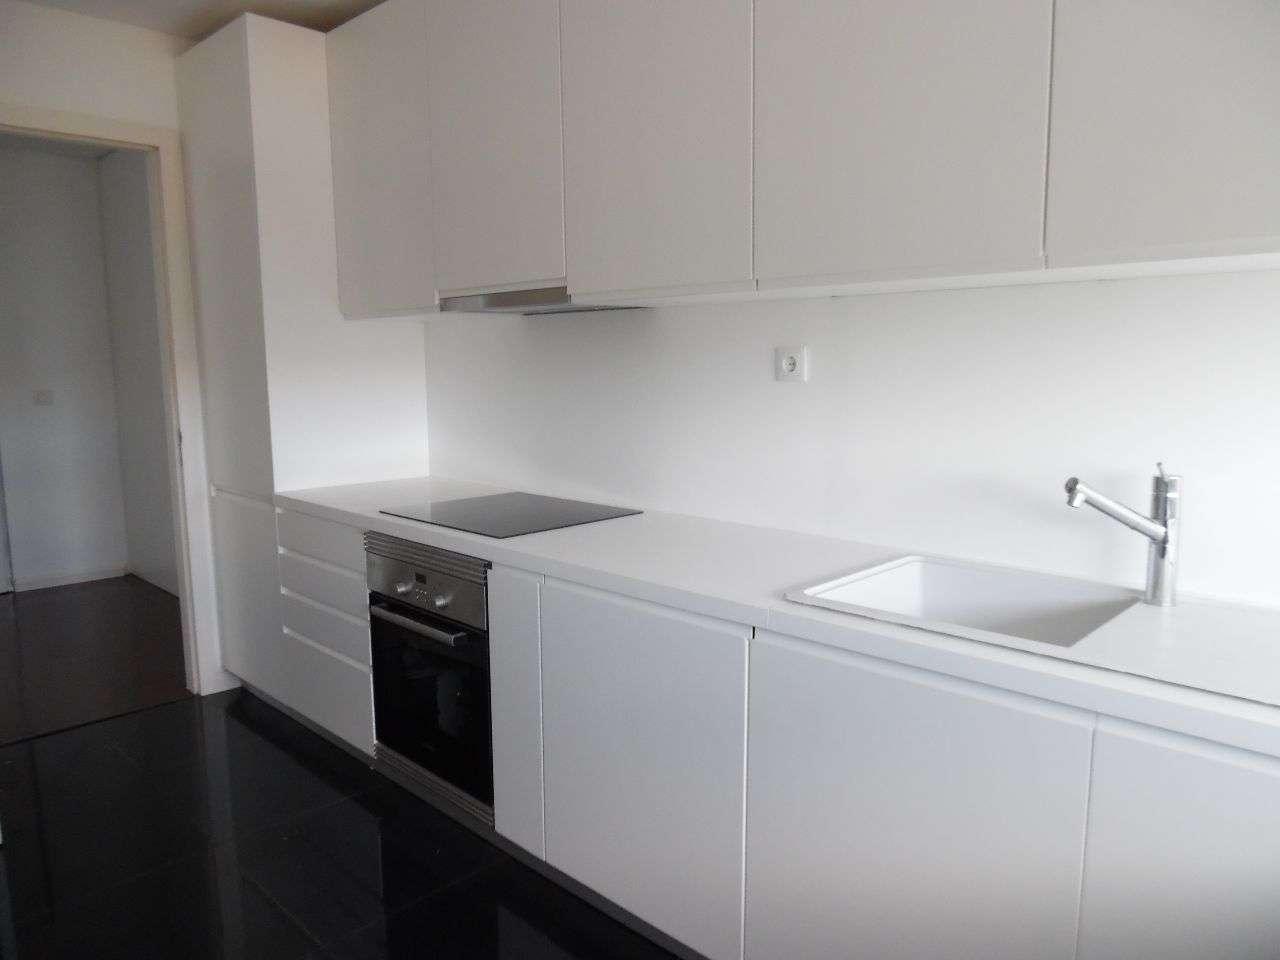 Apartamento para comprar, Campolide, Lisboa - Foto 6